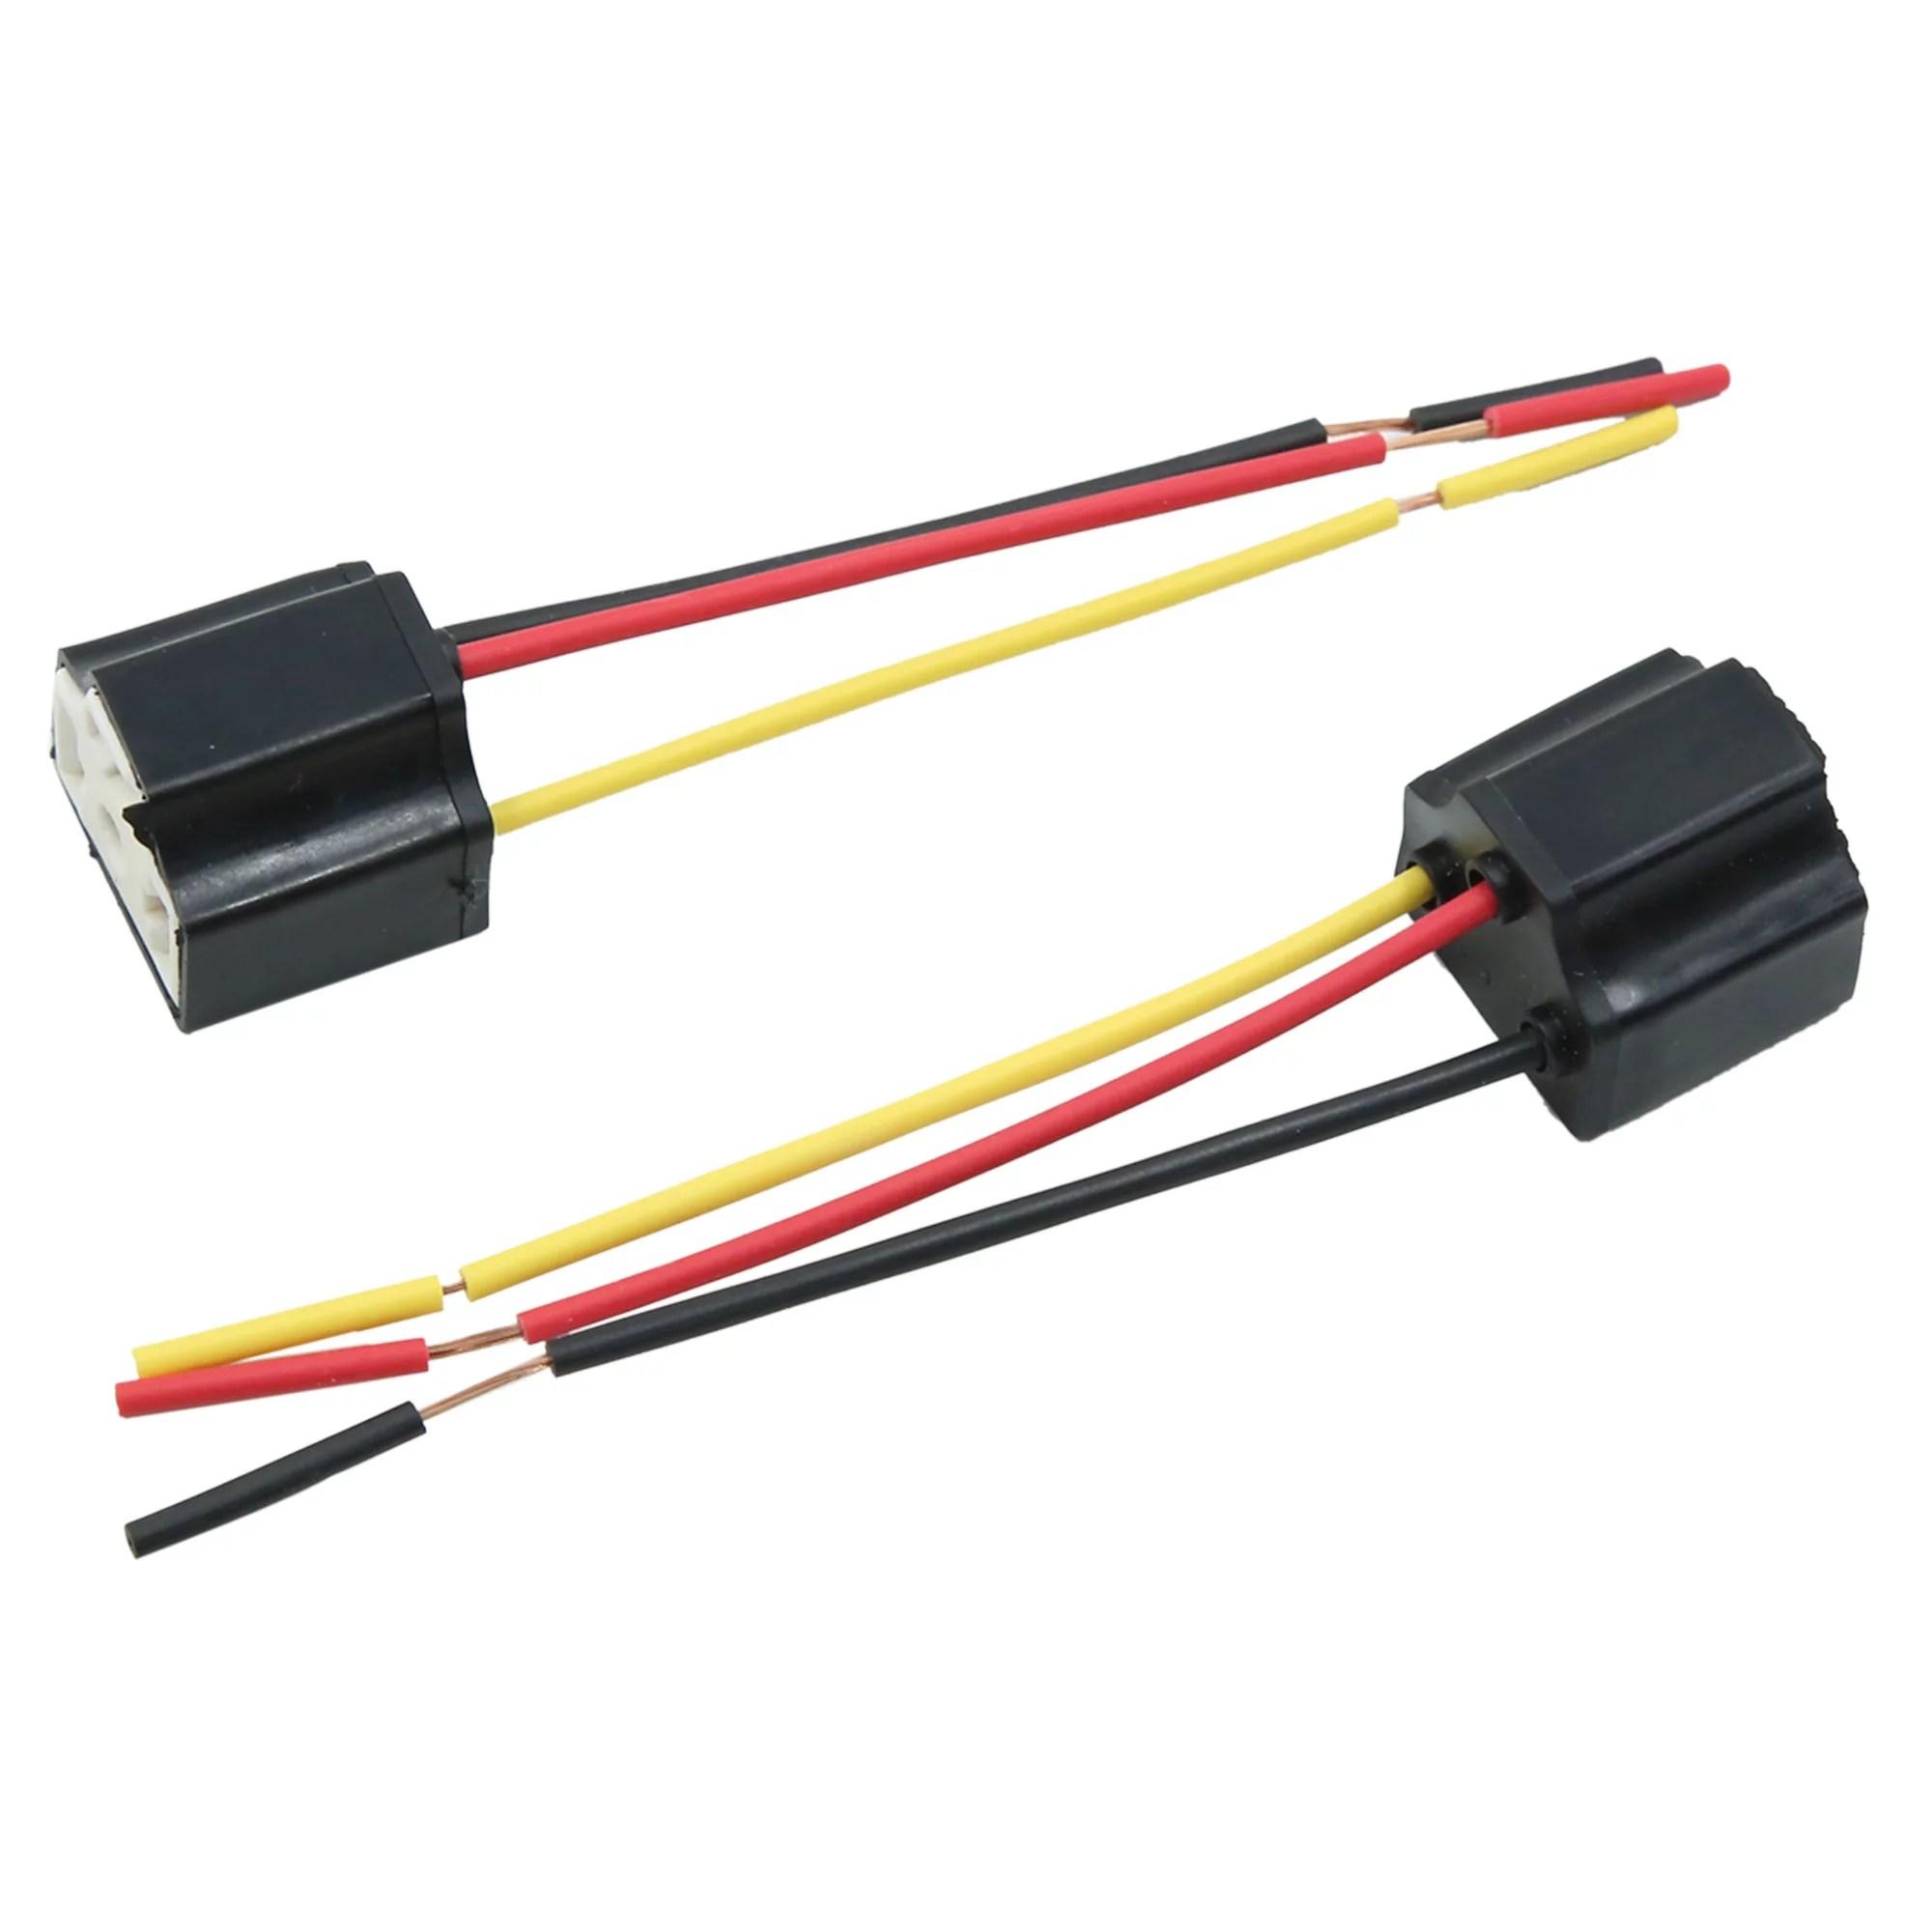 hight resolution of 5pcs dc 12v headlight foglight h4 bulb socket plug connector wiring harness